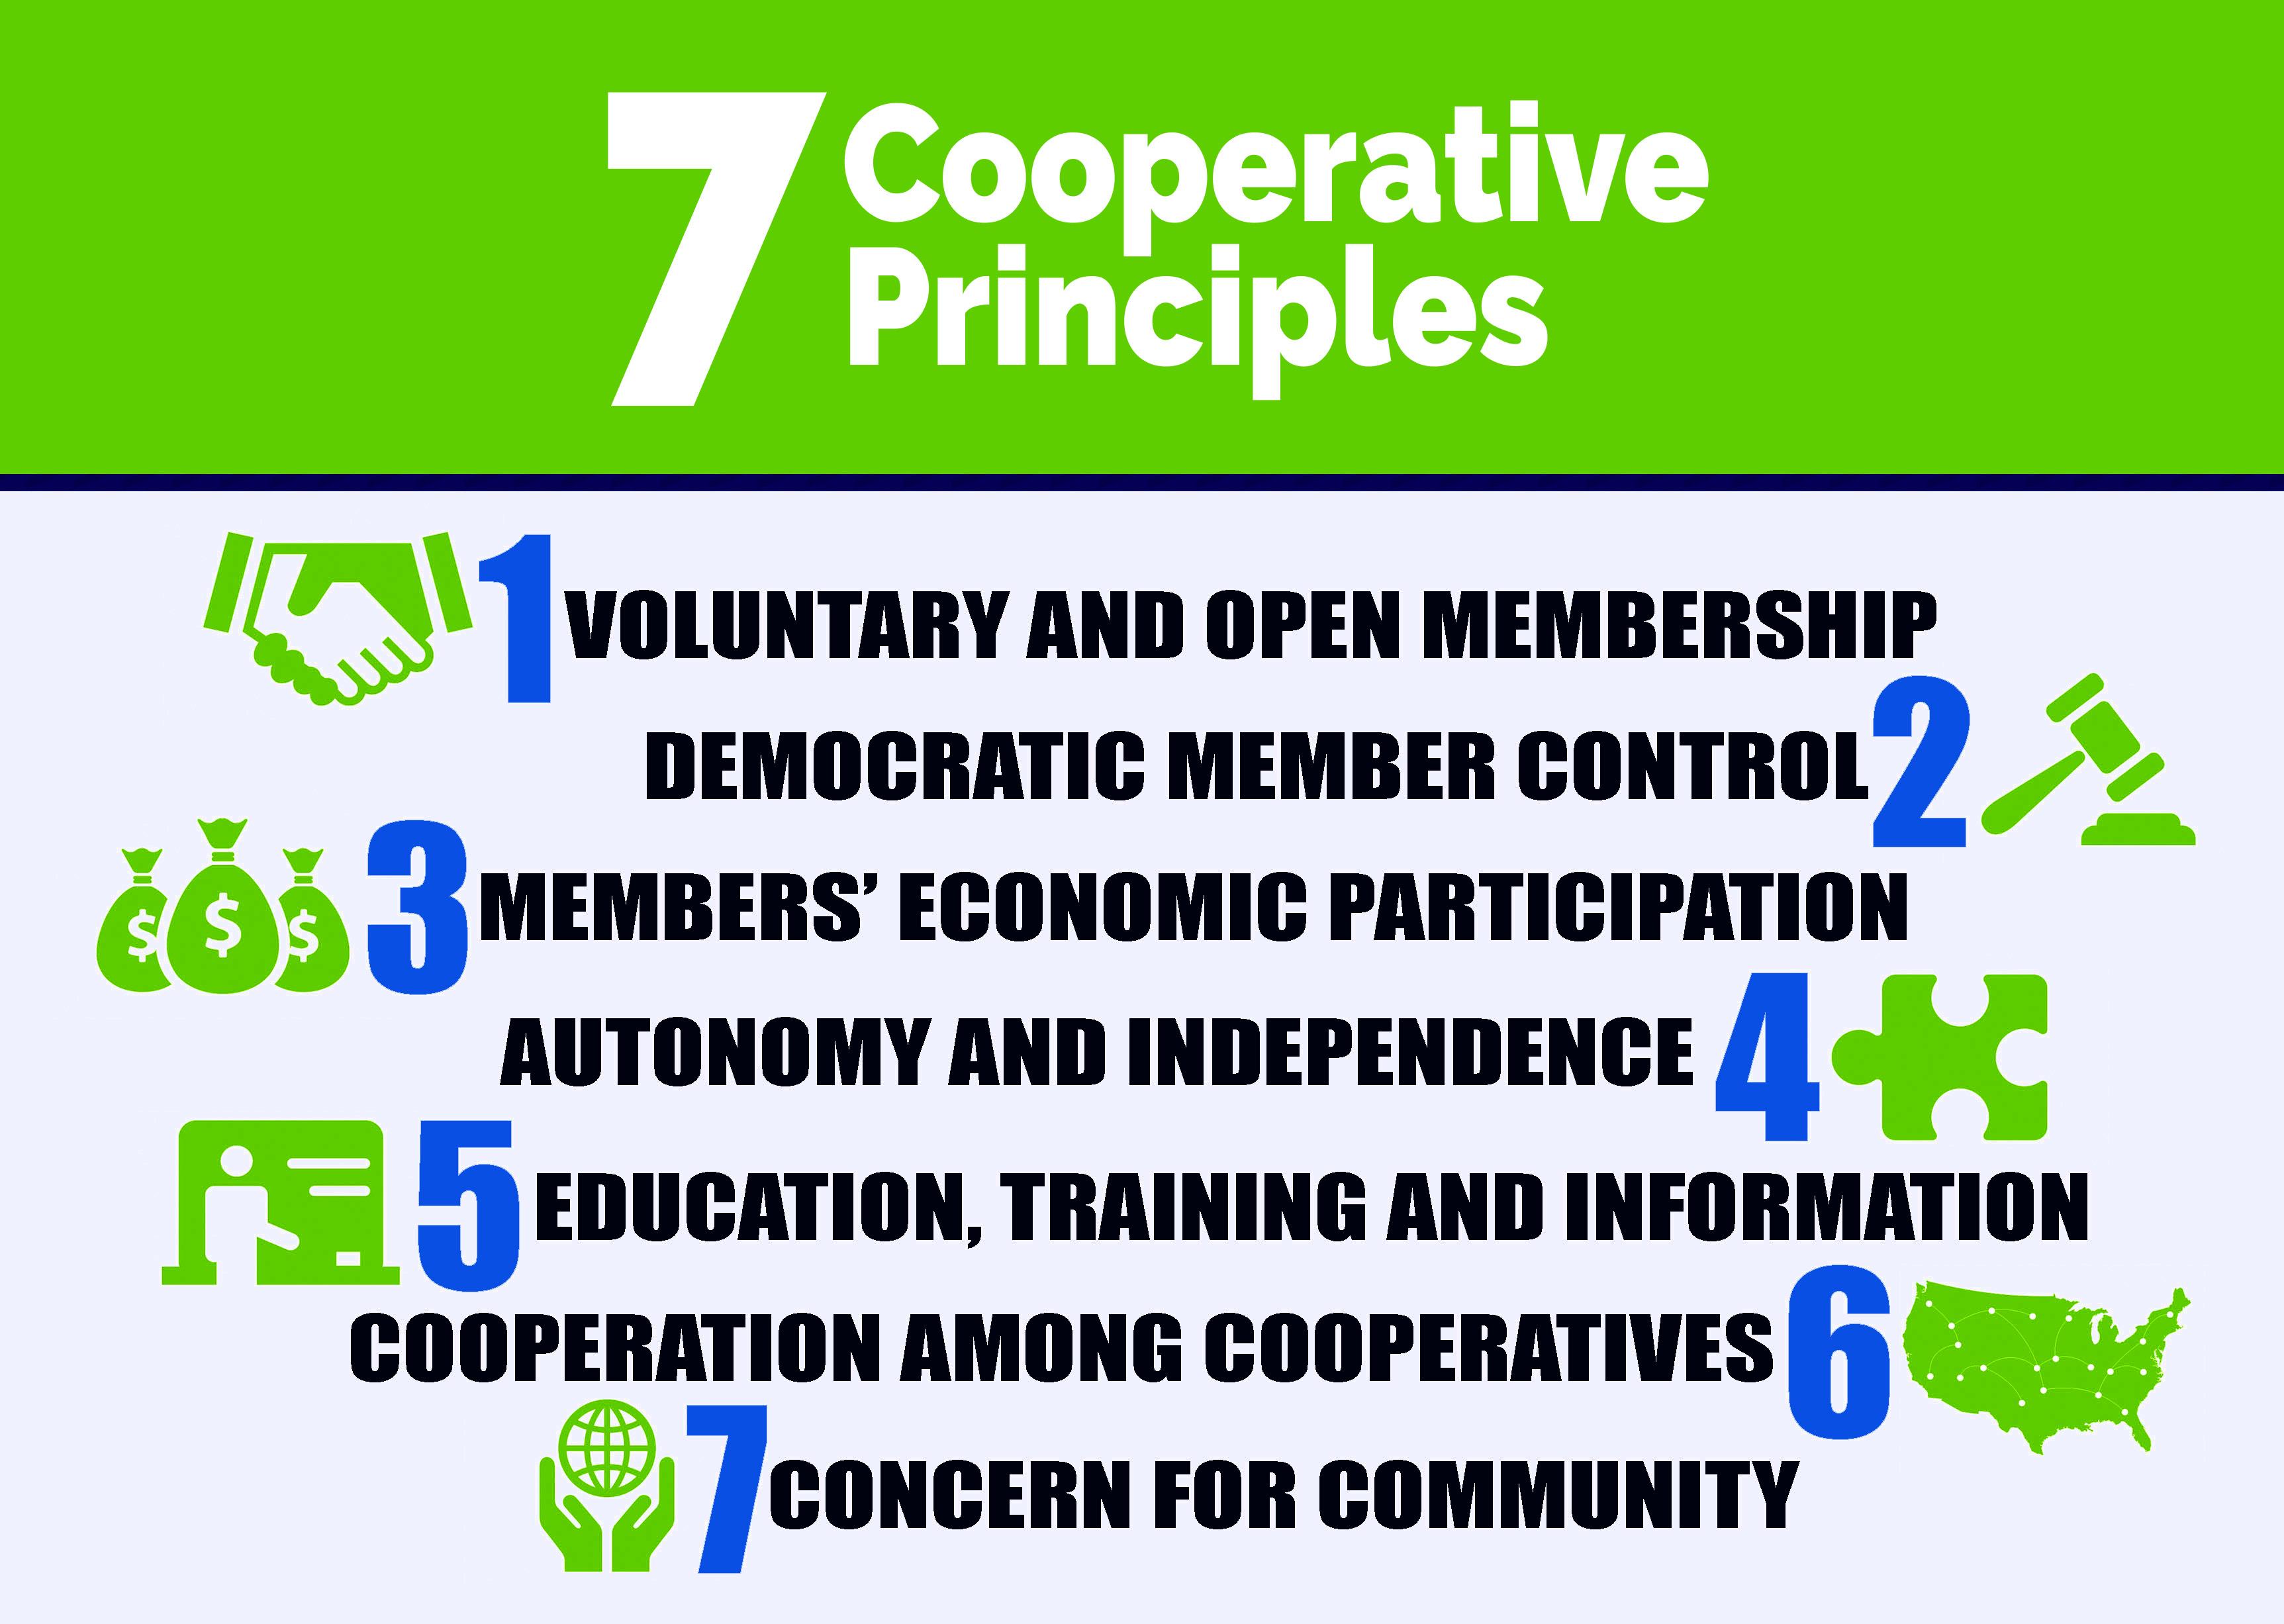 7-cooperative-principles